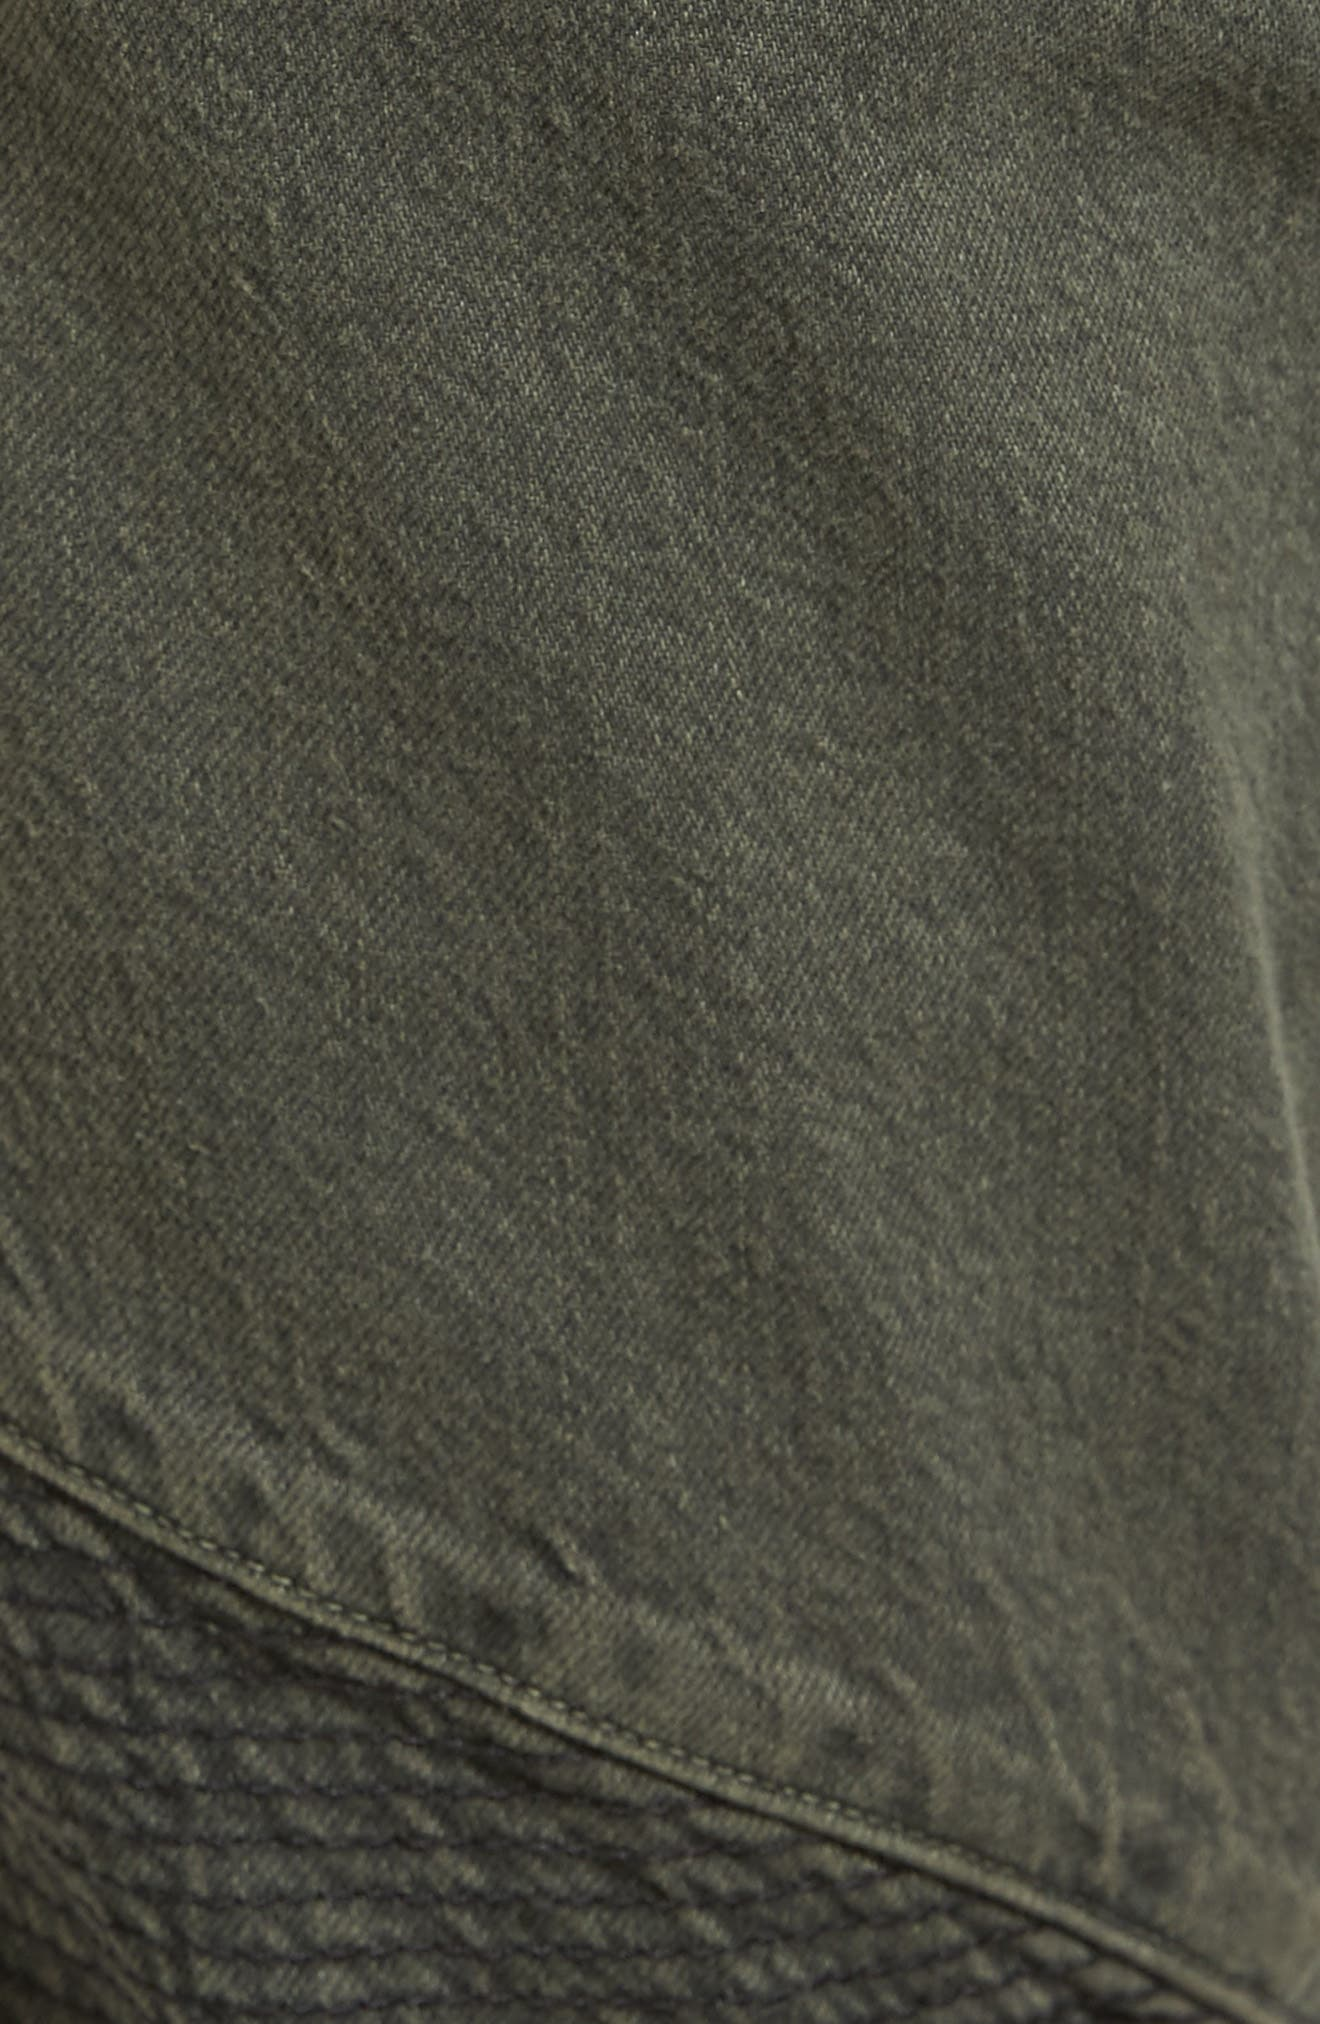 Blinder Biker Skinny Fit Jeans,                             Alternate thumbnail 5, color,                             Fortitude Green